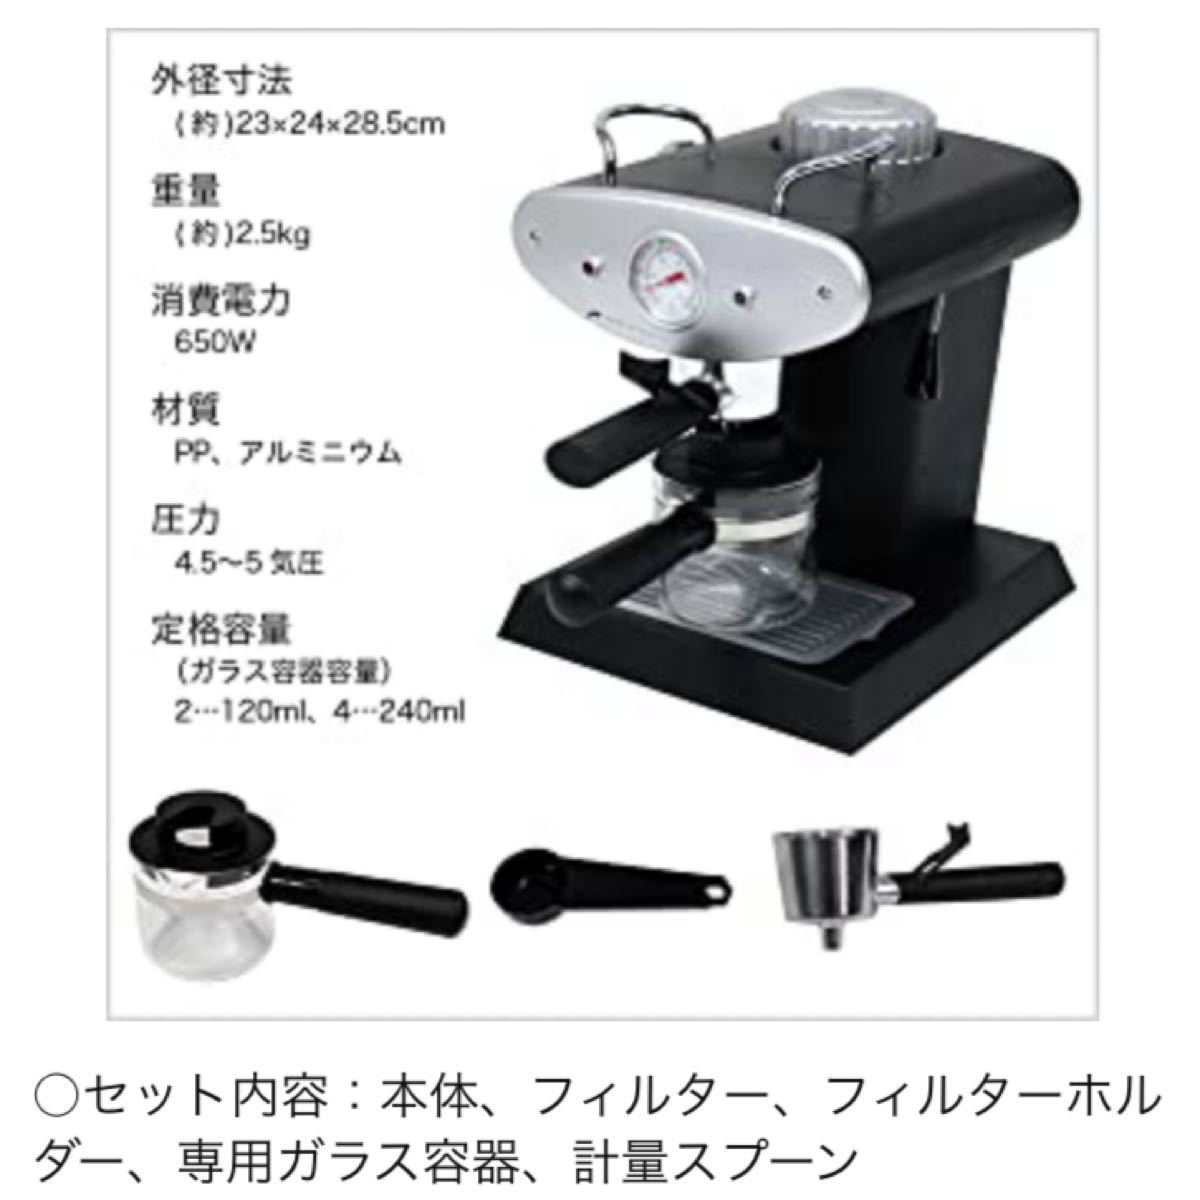 SIS エスプレッソメーカーバリスタ コーヒーメーカー 家庭用エスプレッソマシン